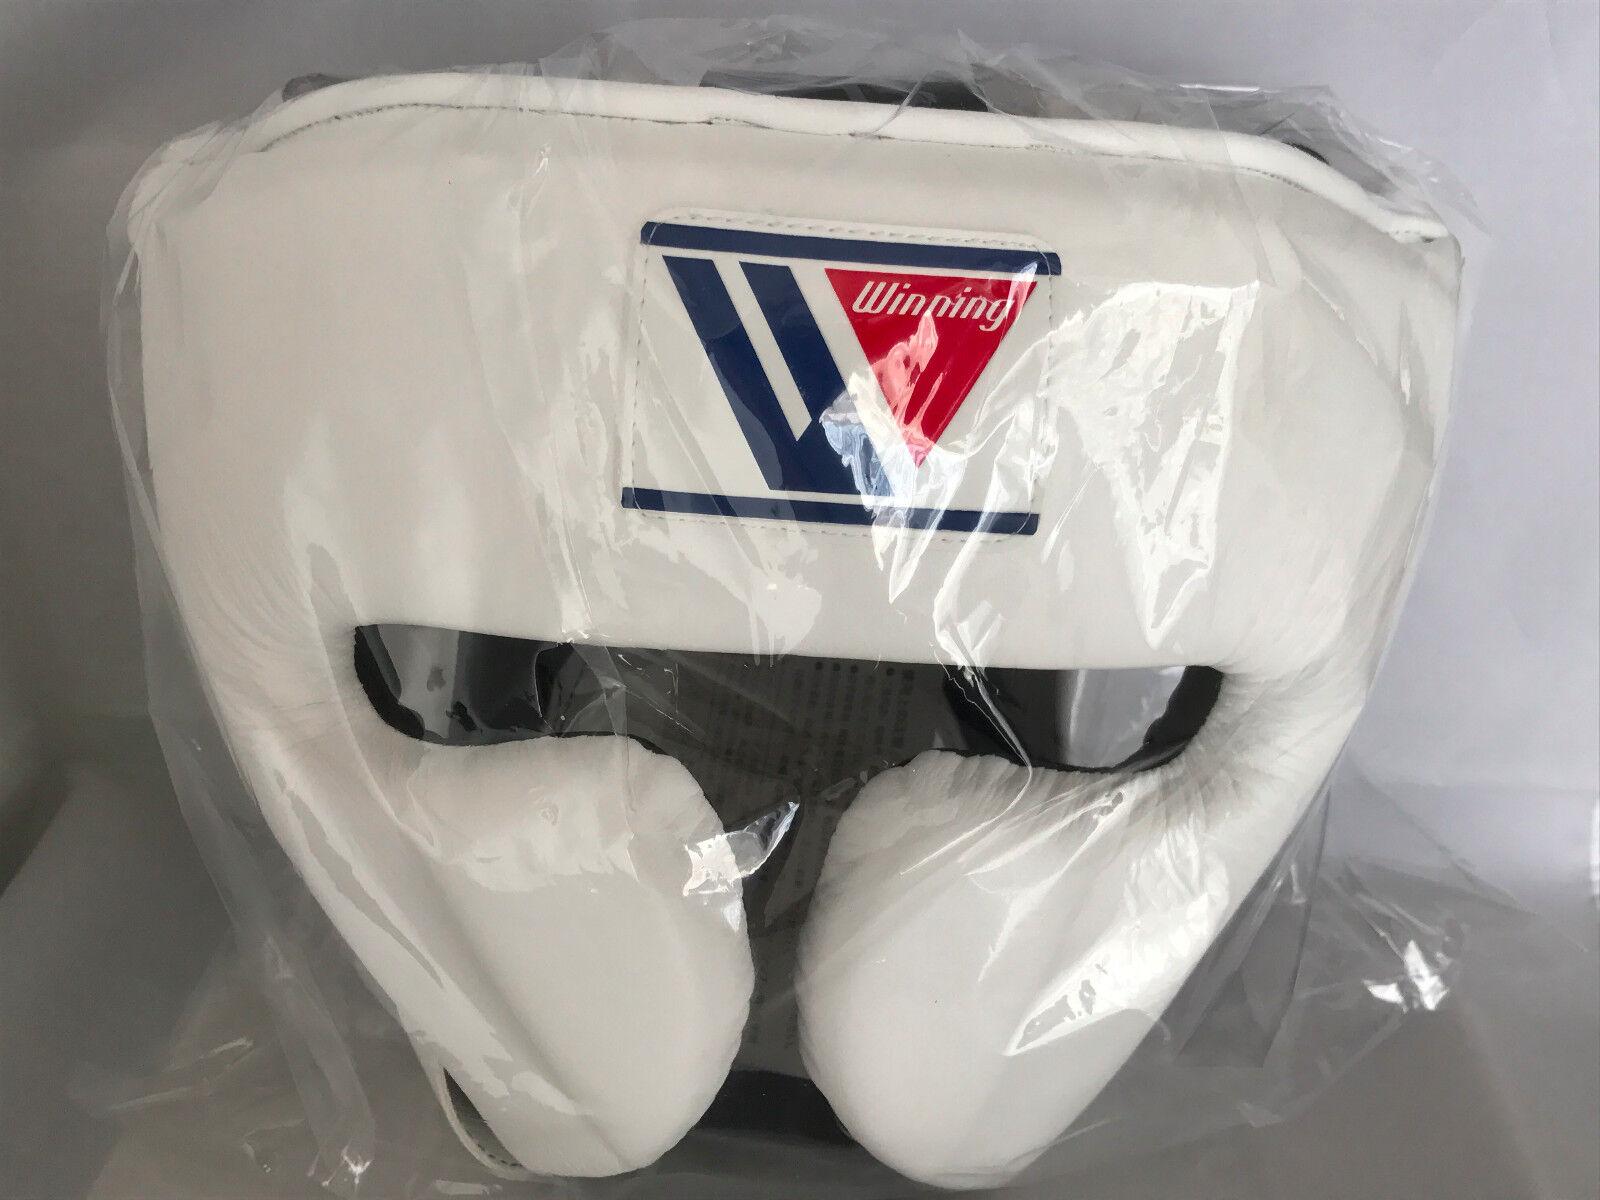 WINNING Boxing Head Gear FG-2900 Training White Medium Size Made in Japan NEW